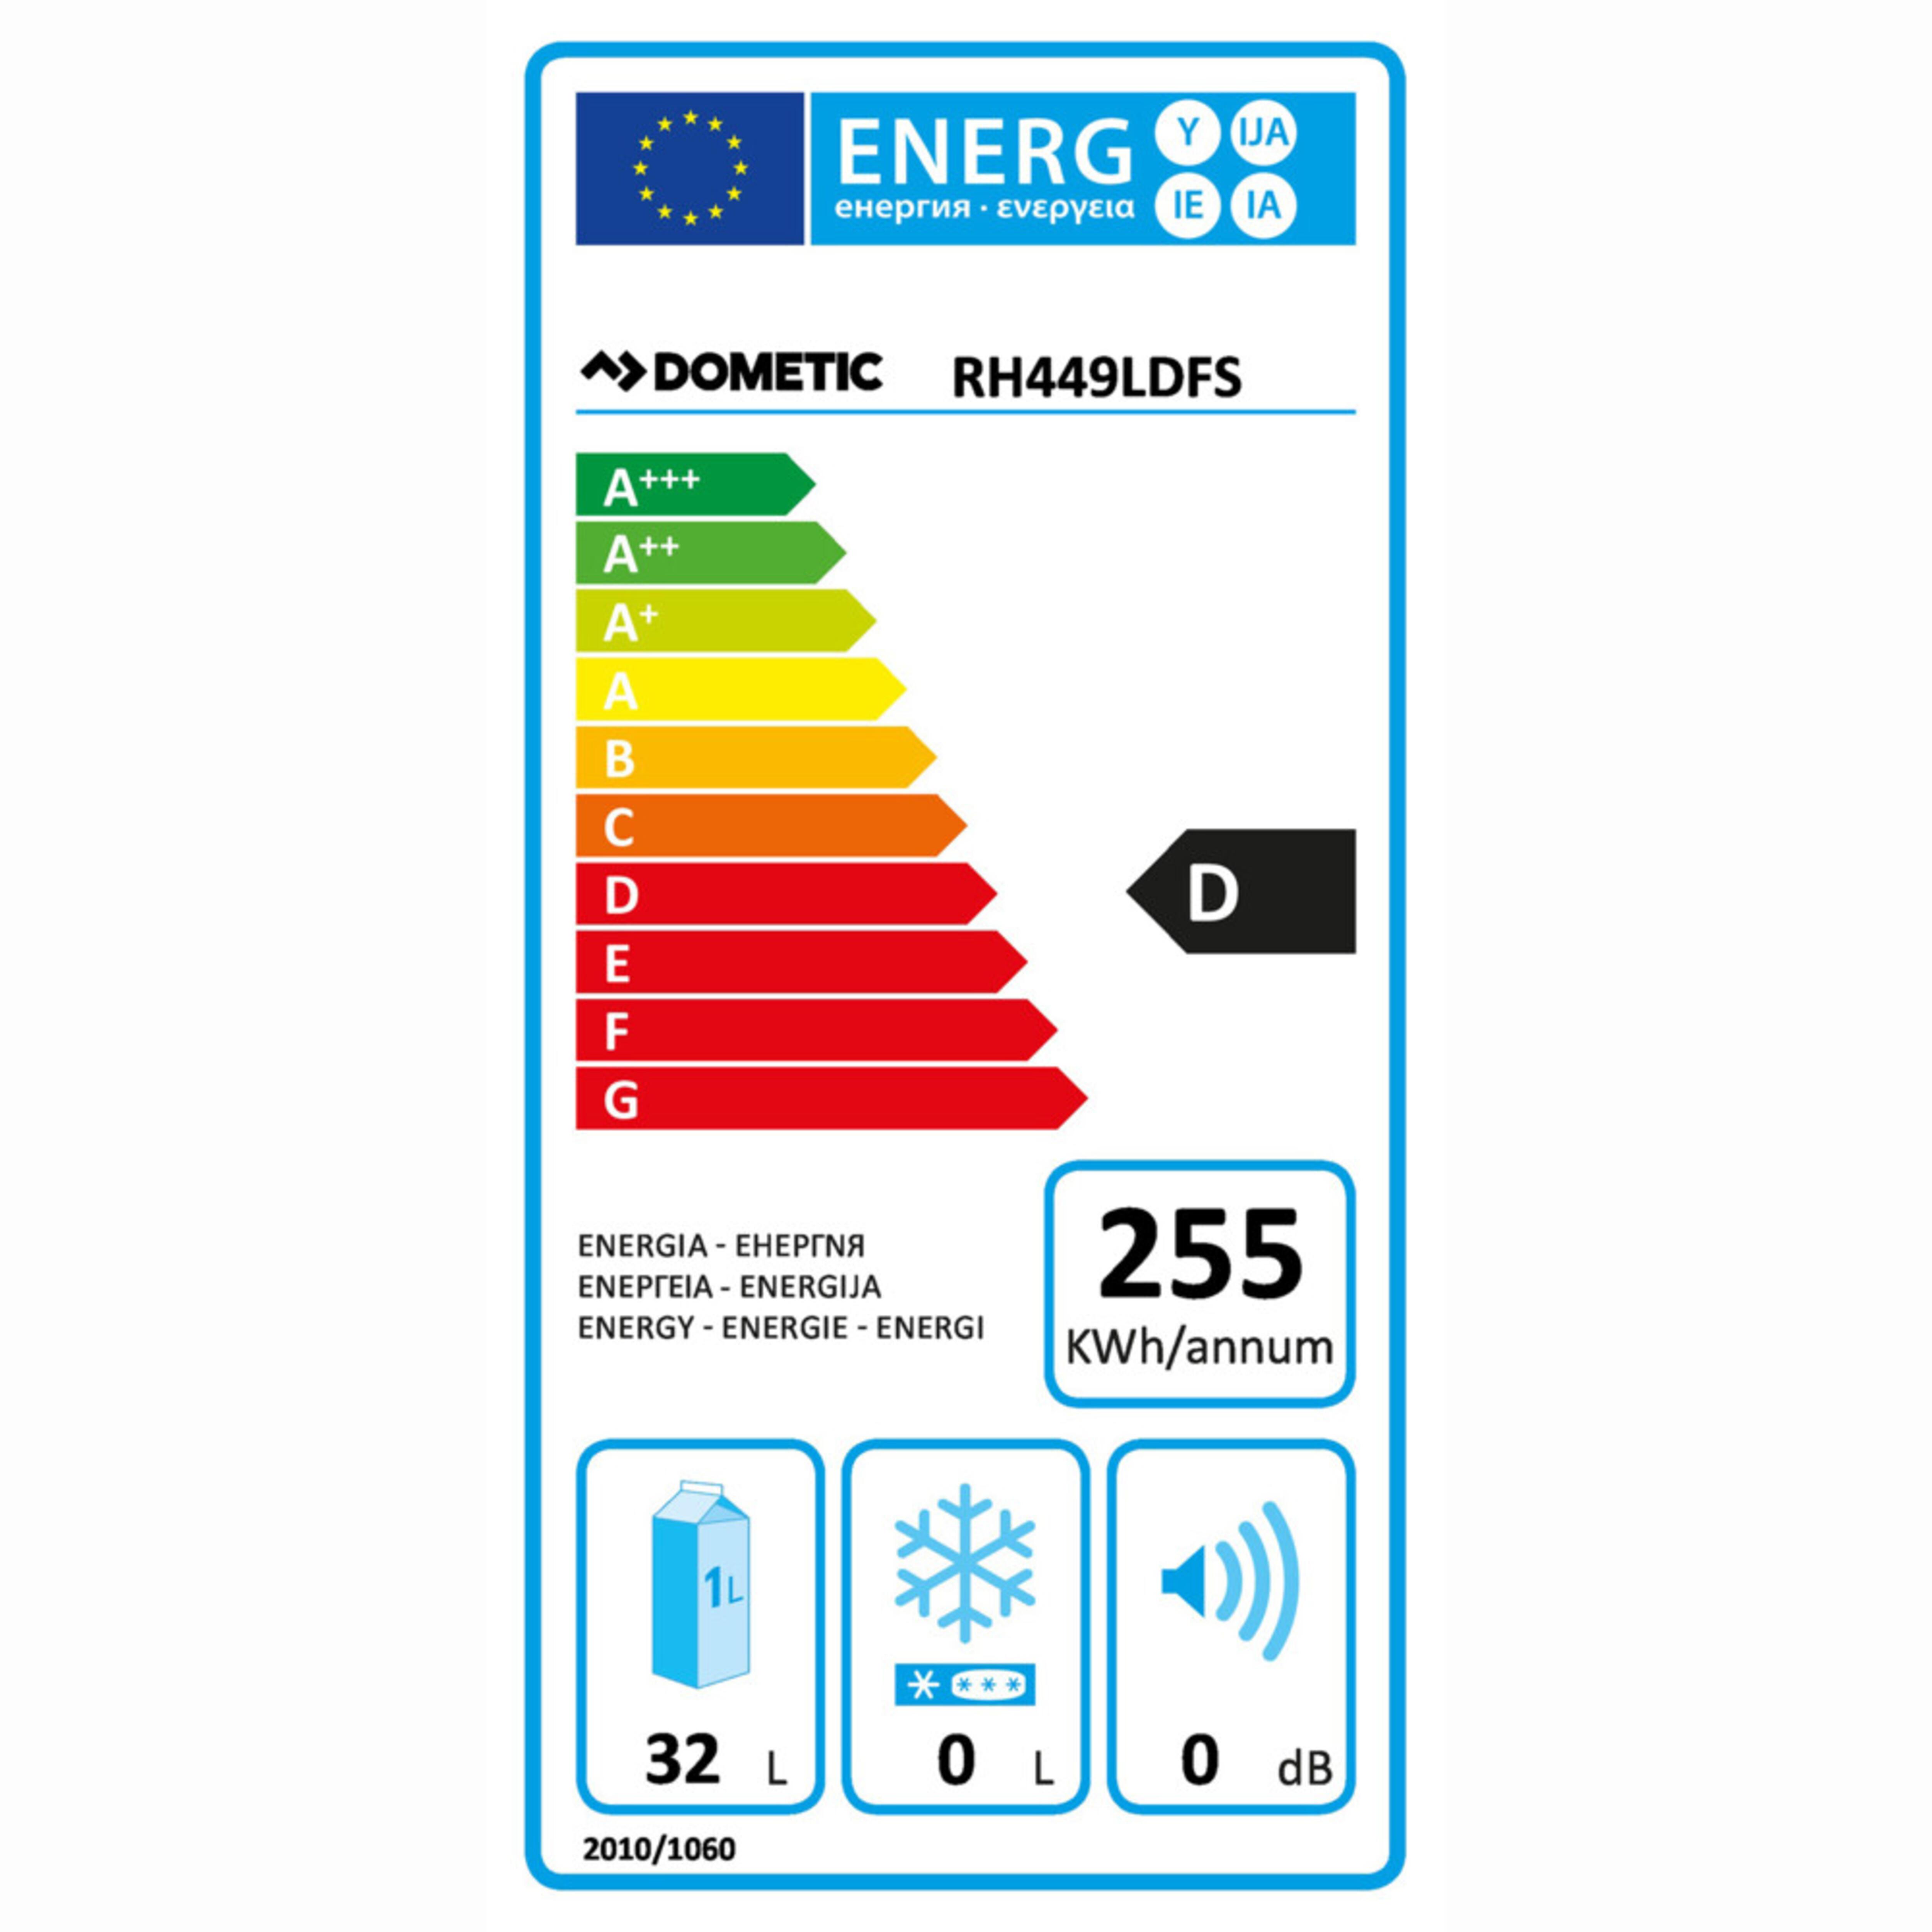 Dometic RH 449 LDFS Energy label